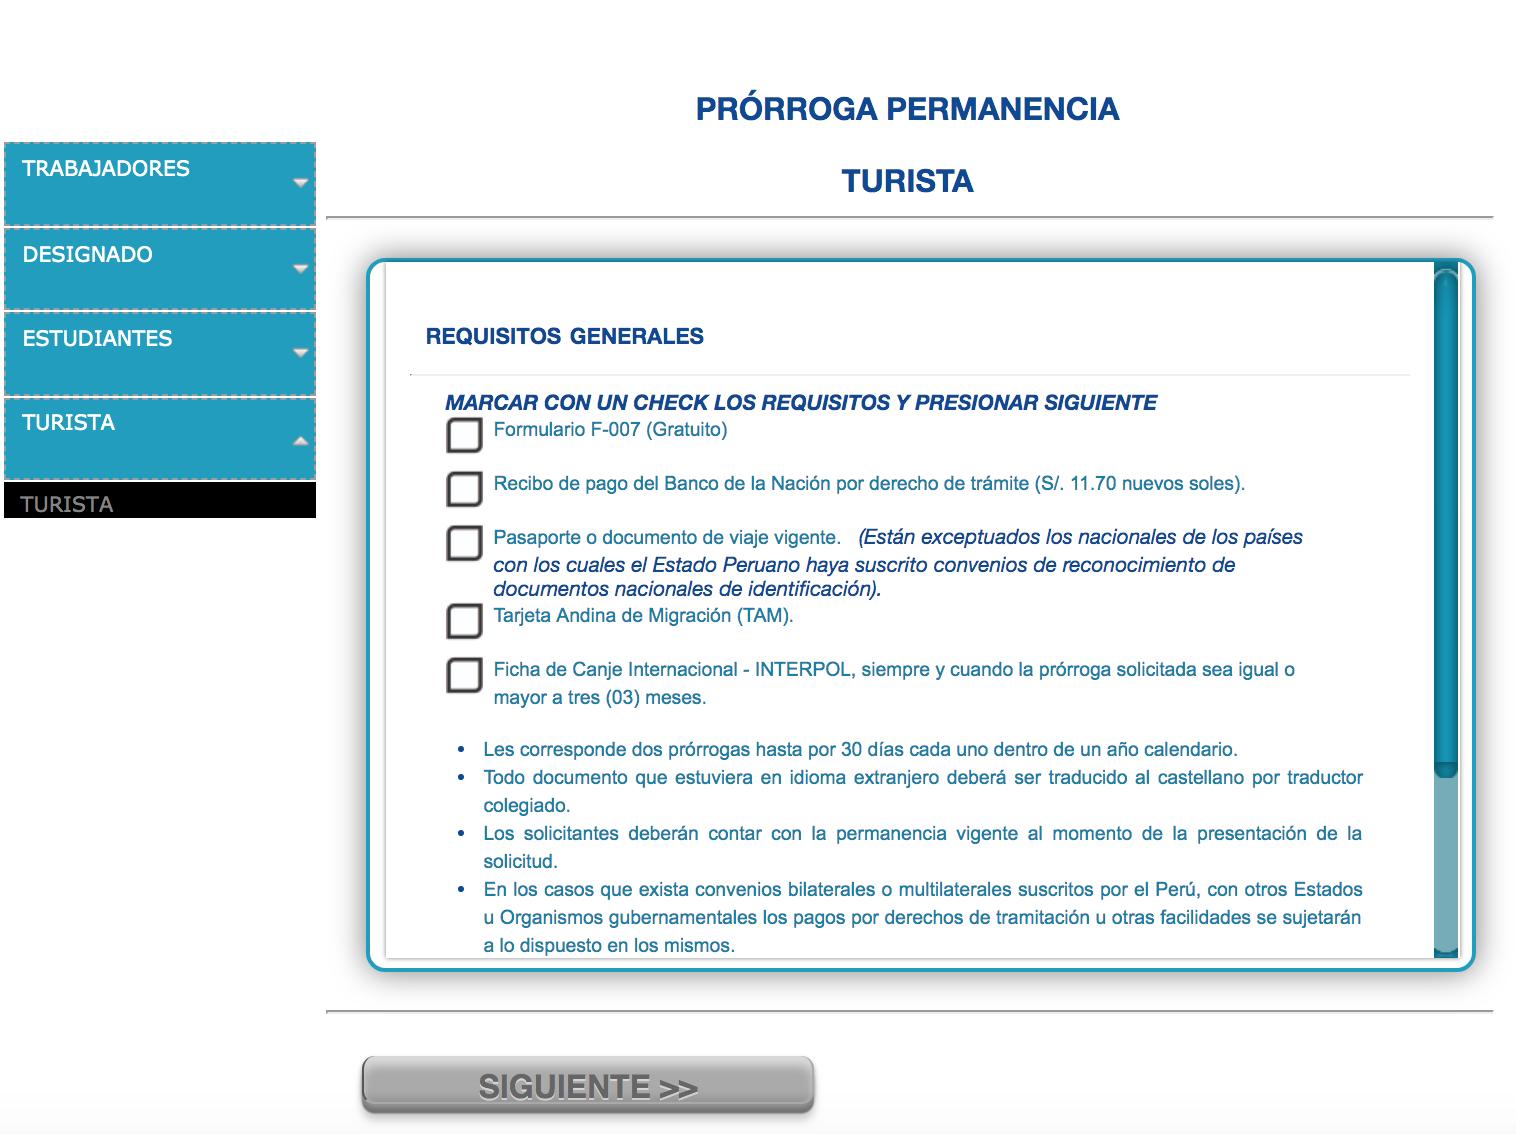 Extend Peru Tourist Visa PRORROGA PERMANENCIA